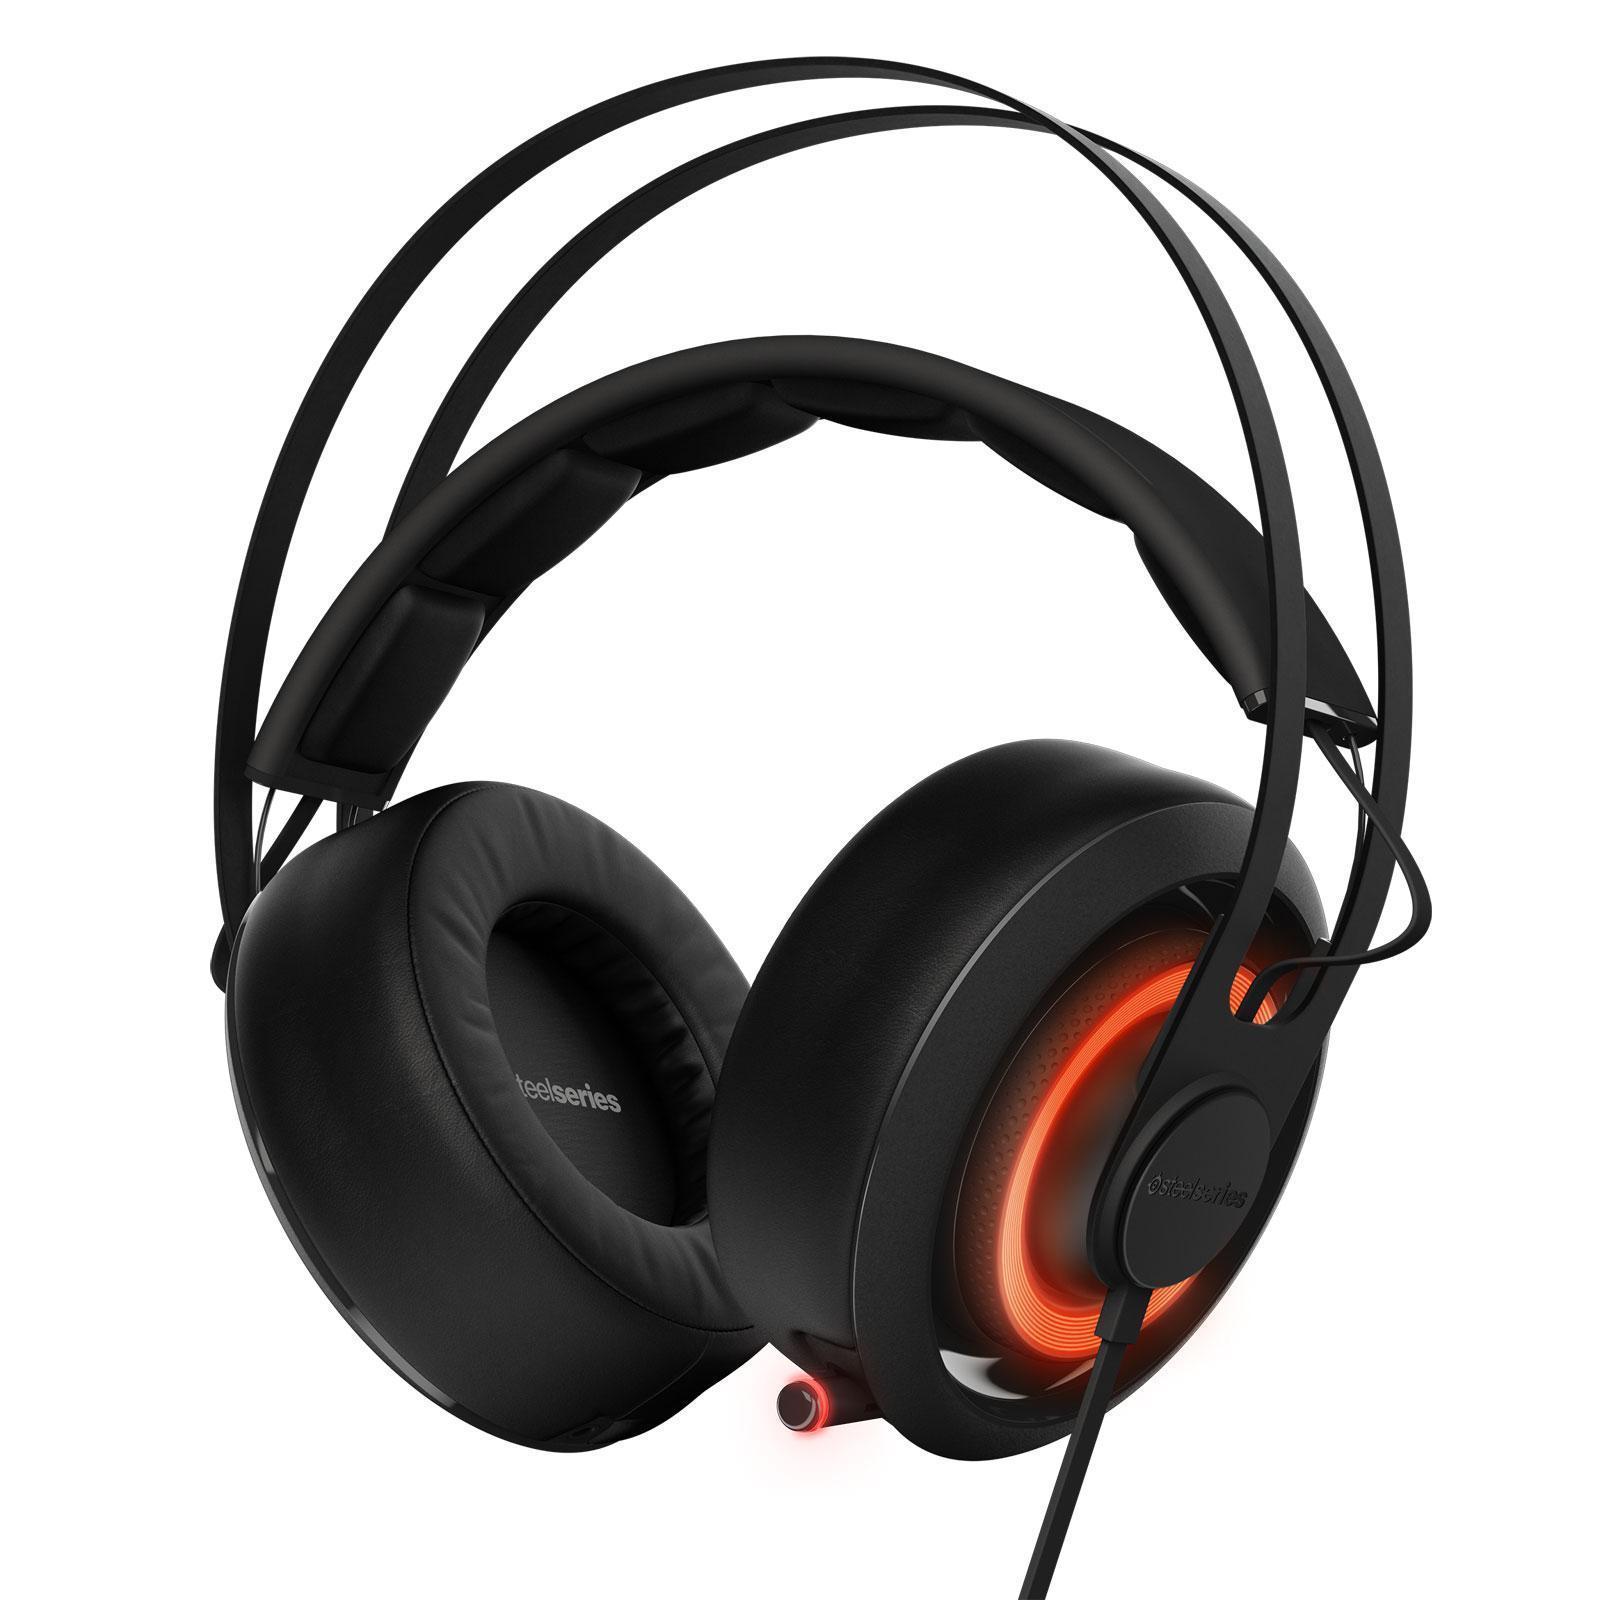 Steelseries Siberia 650 Gaming Ακουστικά Μικρόφωνο - Μαύρο